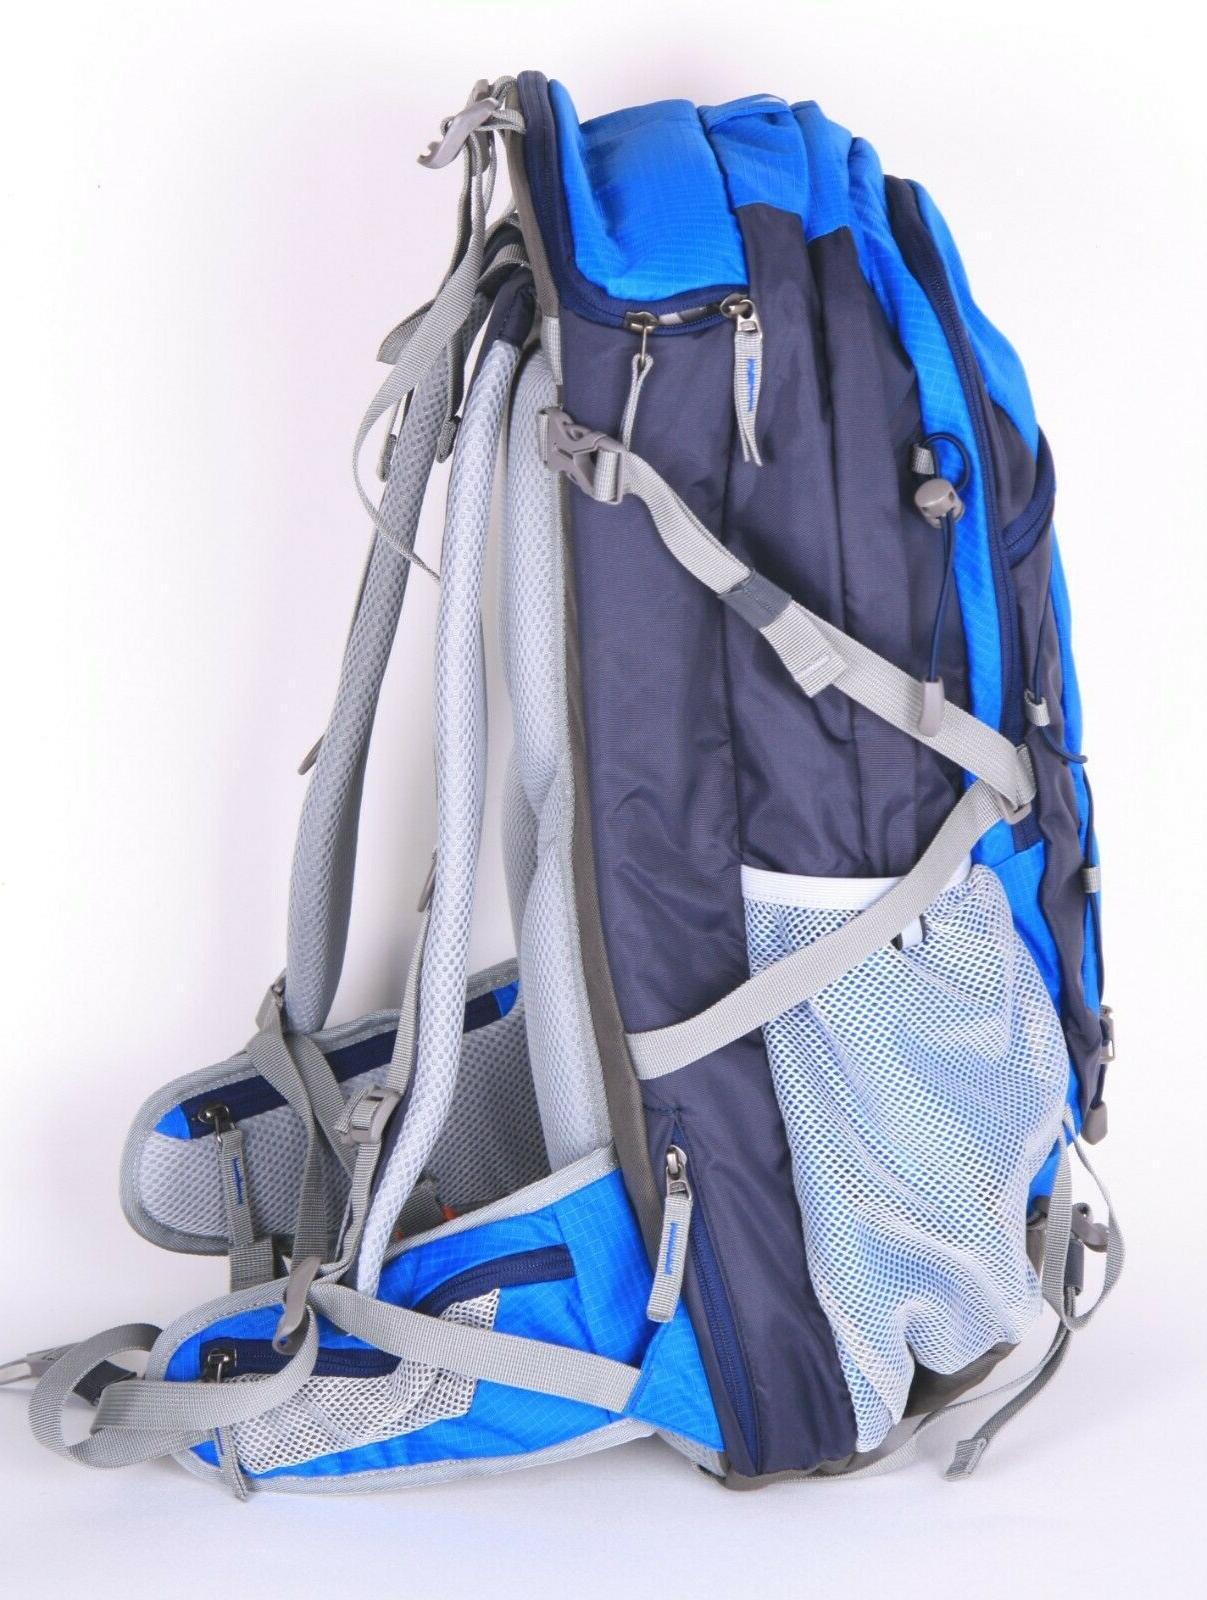 FunShell Hiking Backpack Protection w/ Fan